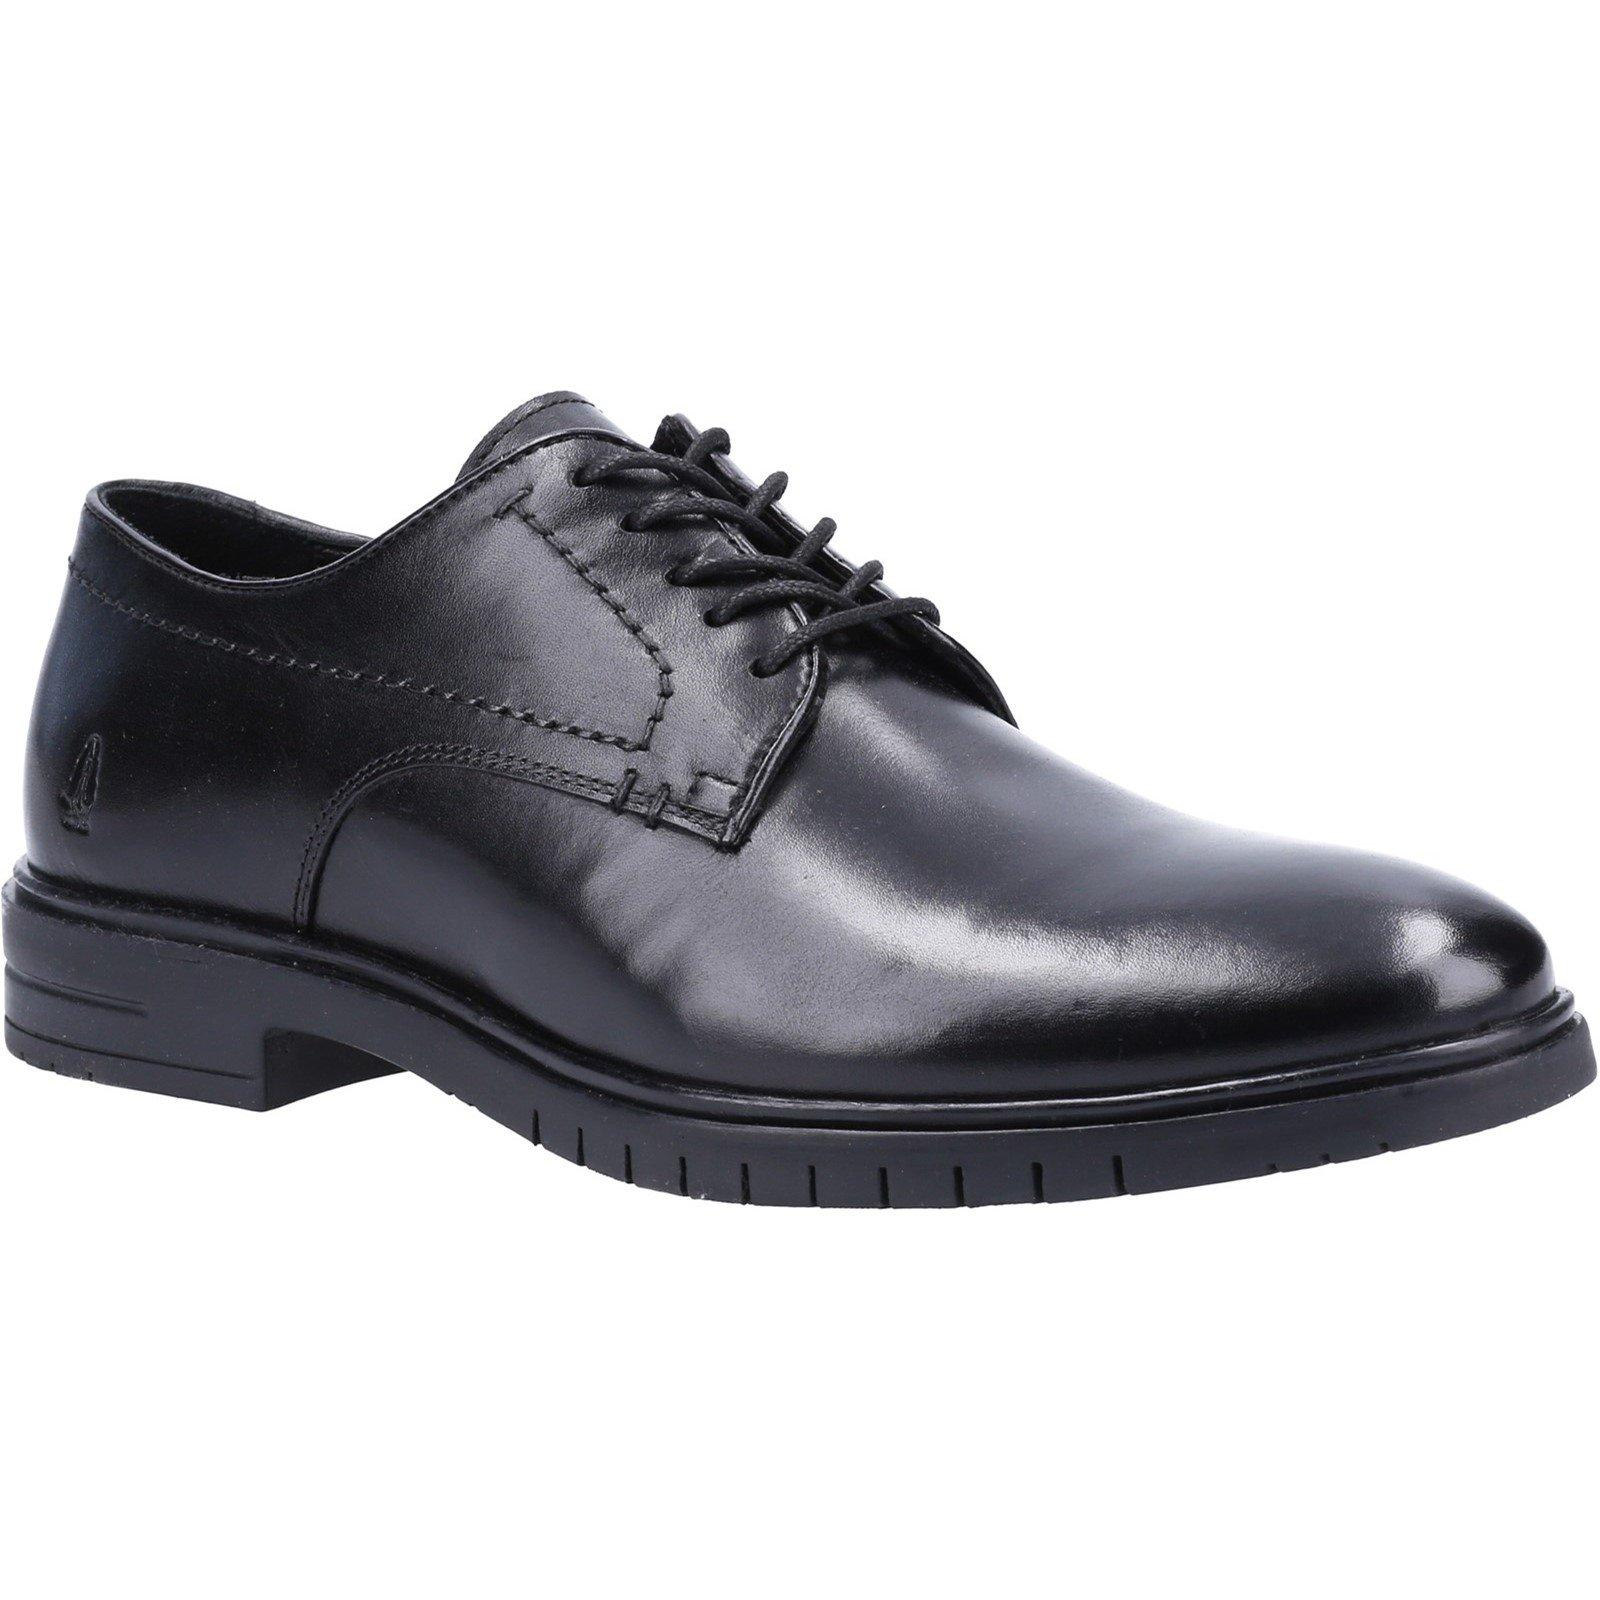 Hush Puppies Men's Sterling Lace Derby Shoe Black 31992 - Black 6